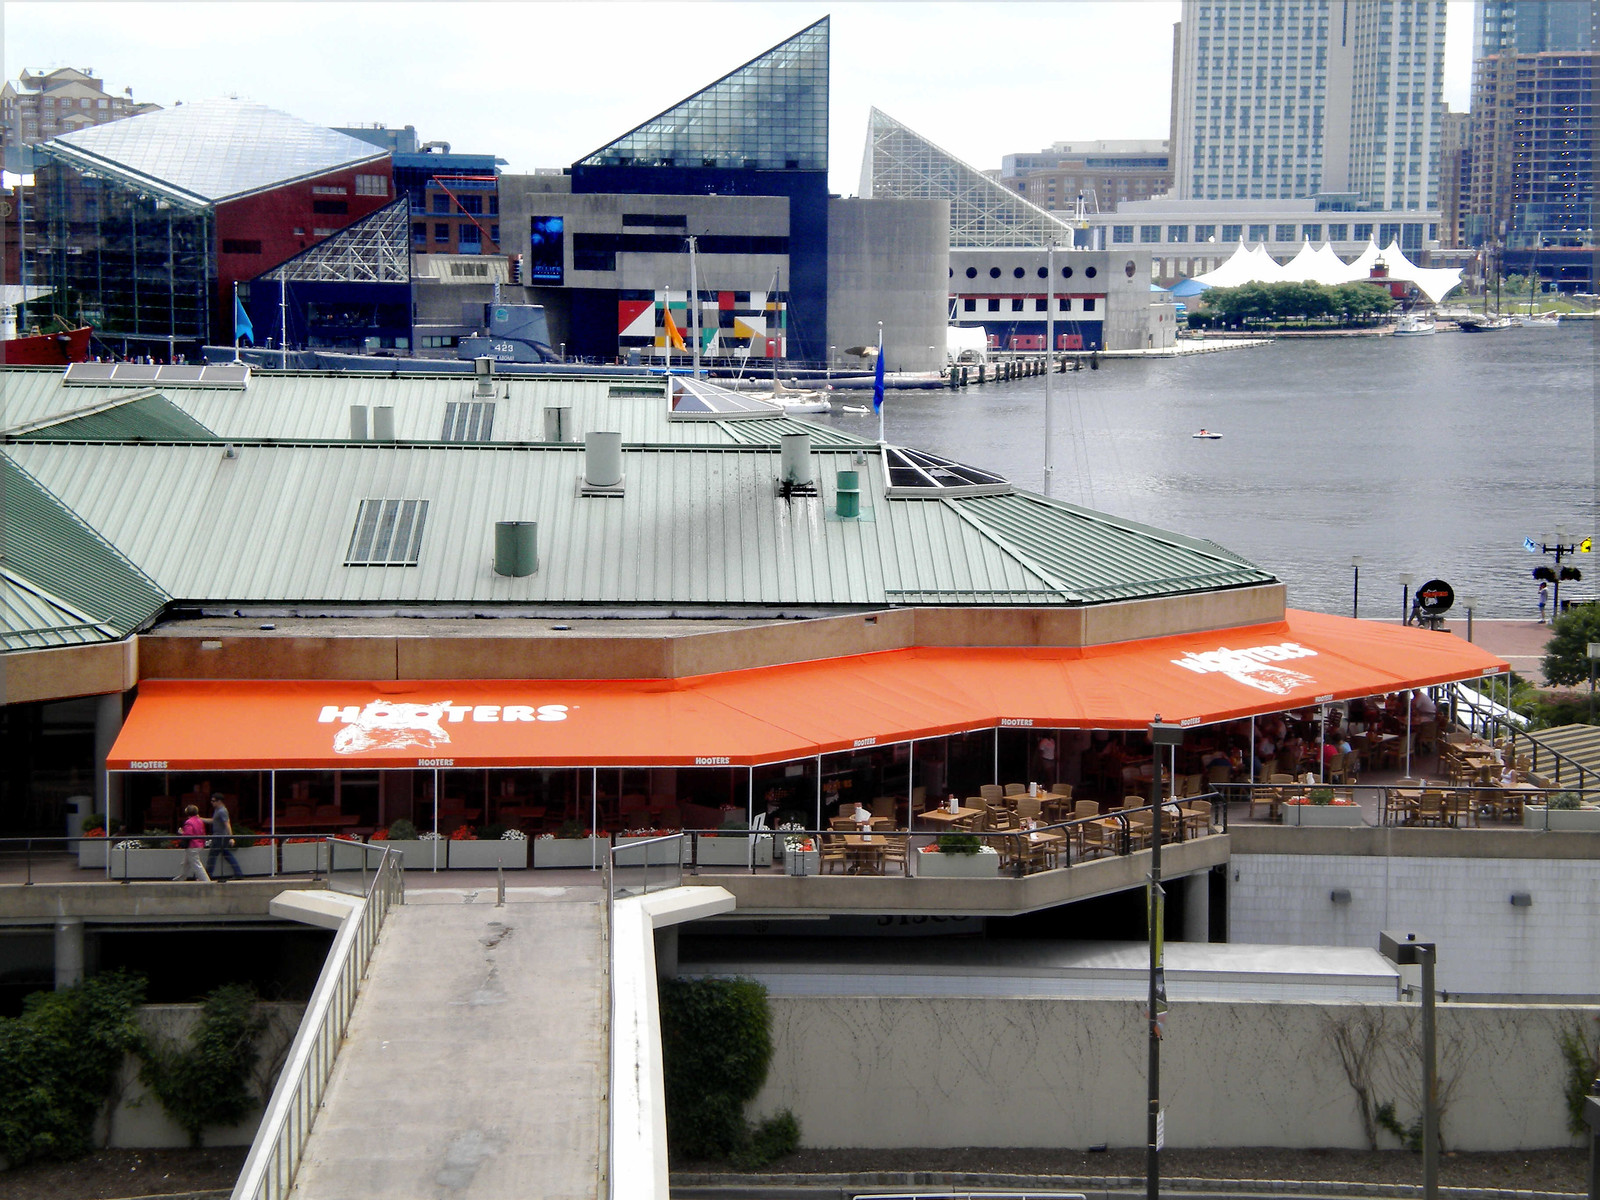 Restaurant Awning in Baltimore